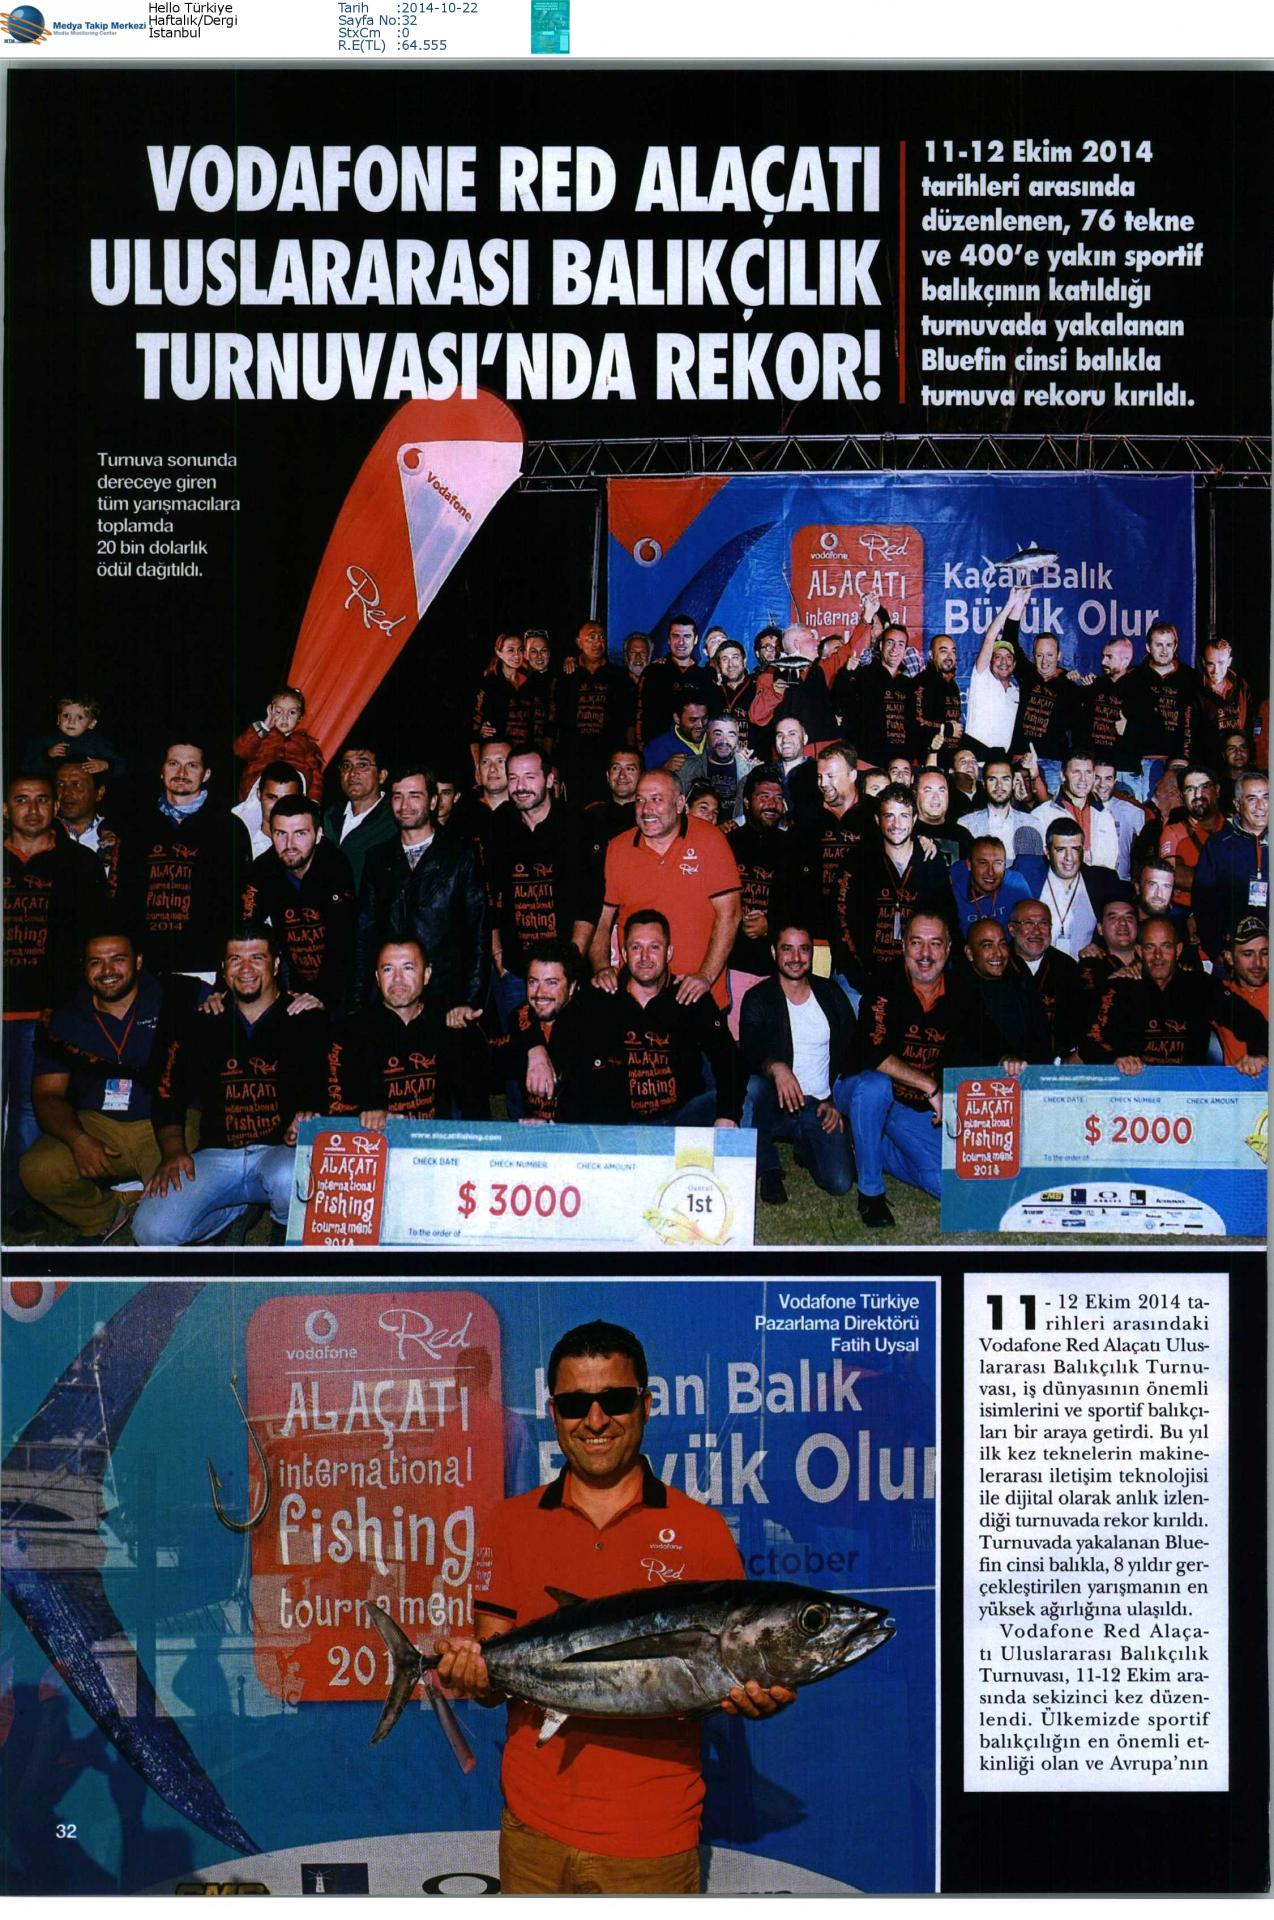 3214_6995_5566-Hello_Turkiye-VODAFONE_RED_ALACATI_ULUSLARARASI_BALIKCILIK_TURNUVASI_NDA_REKOR-22.10.2014